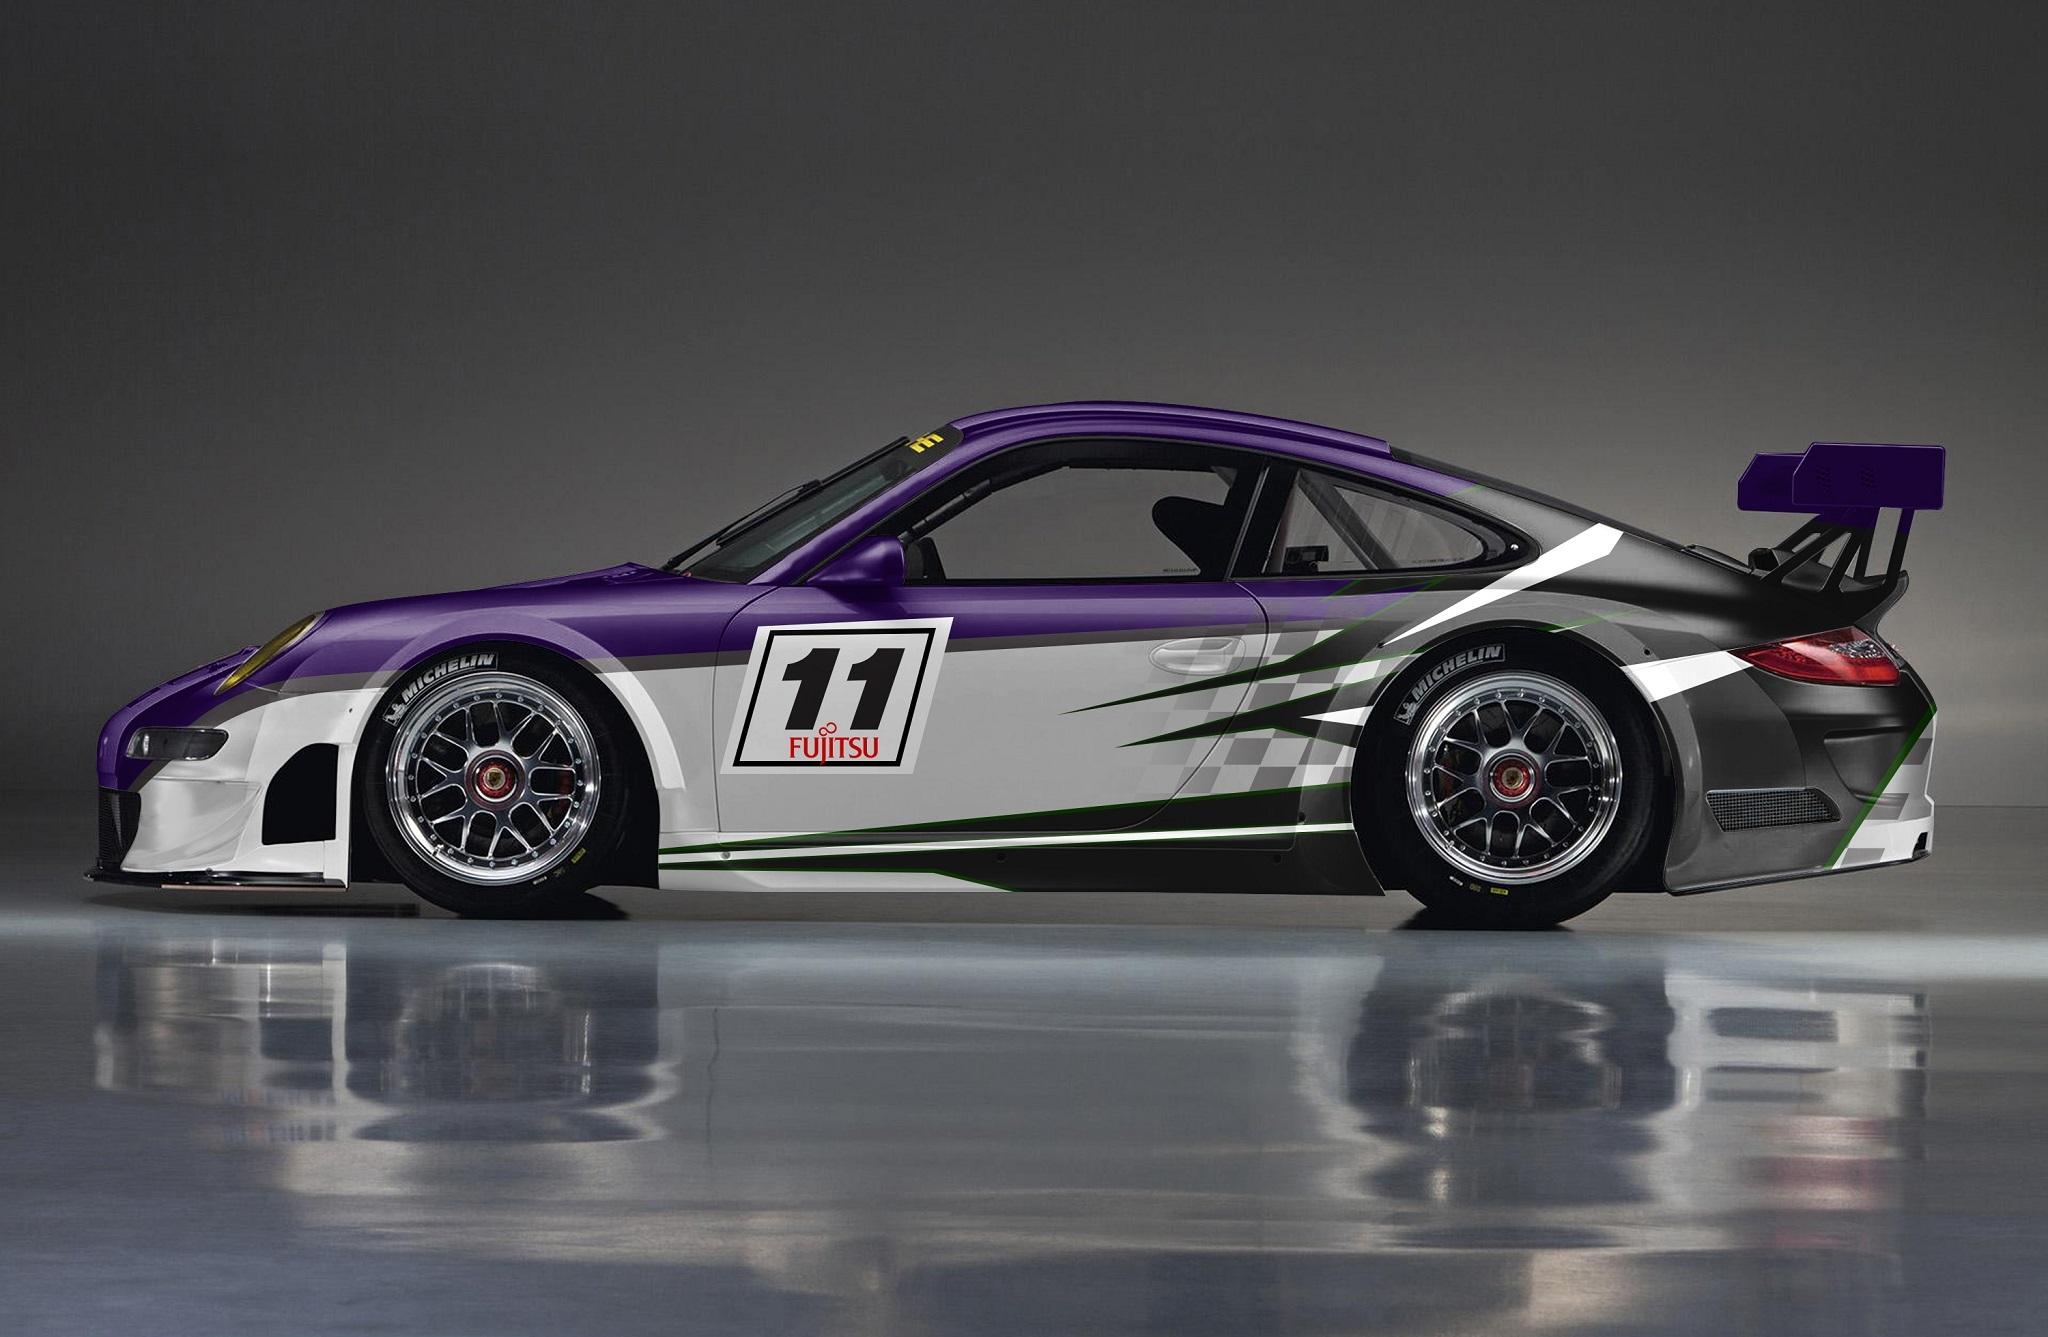 Design rennauto (racing car) Porsche Cup (991) | Vehicle ...